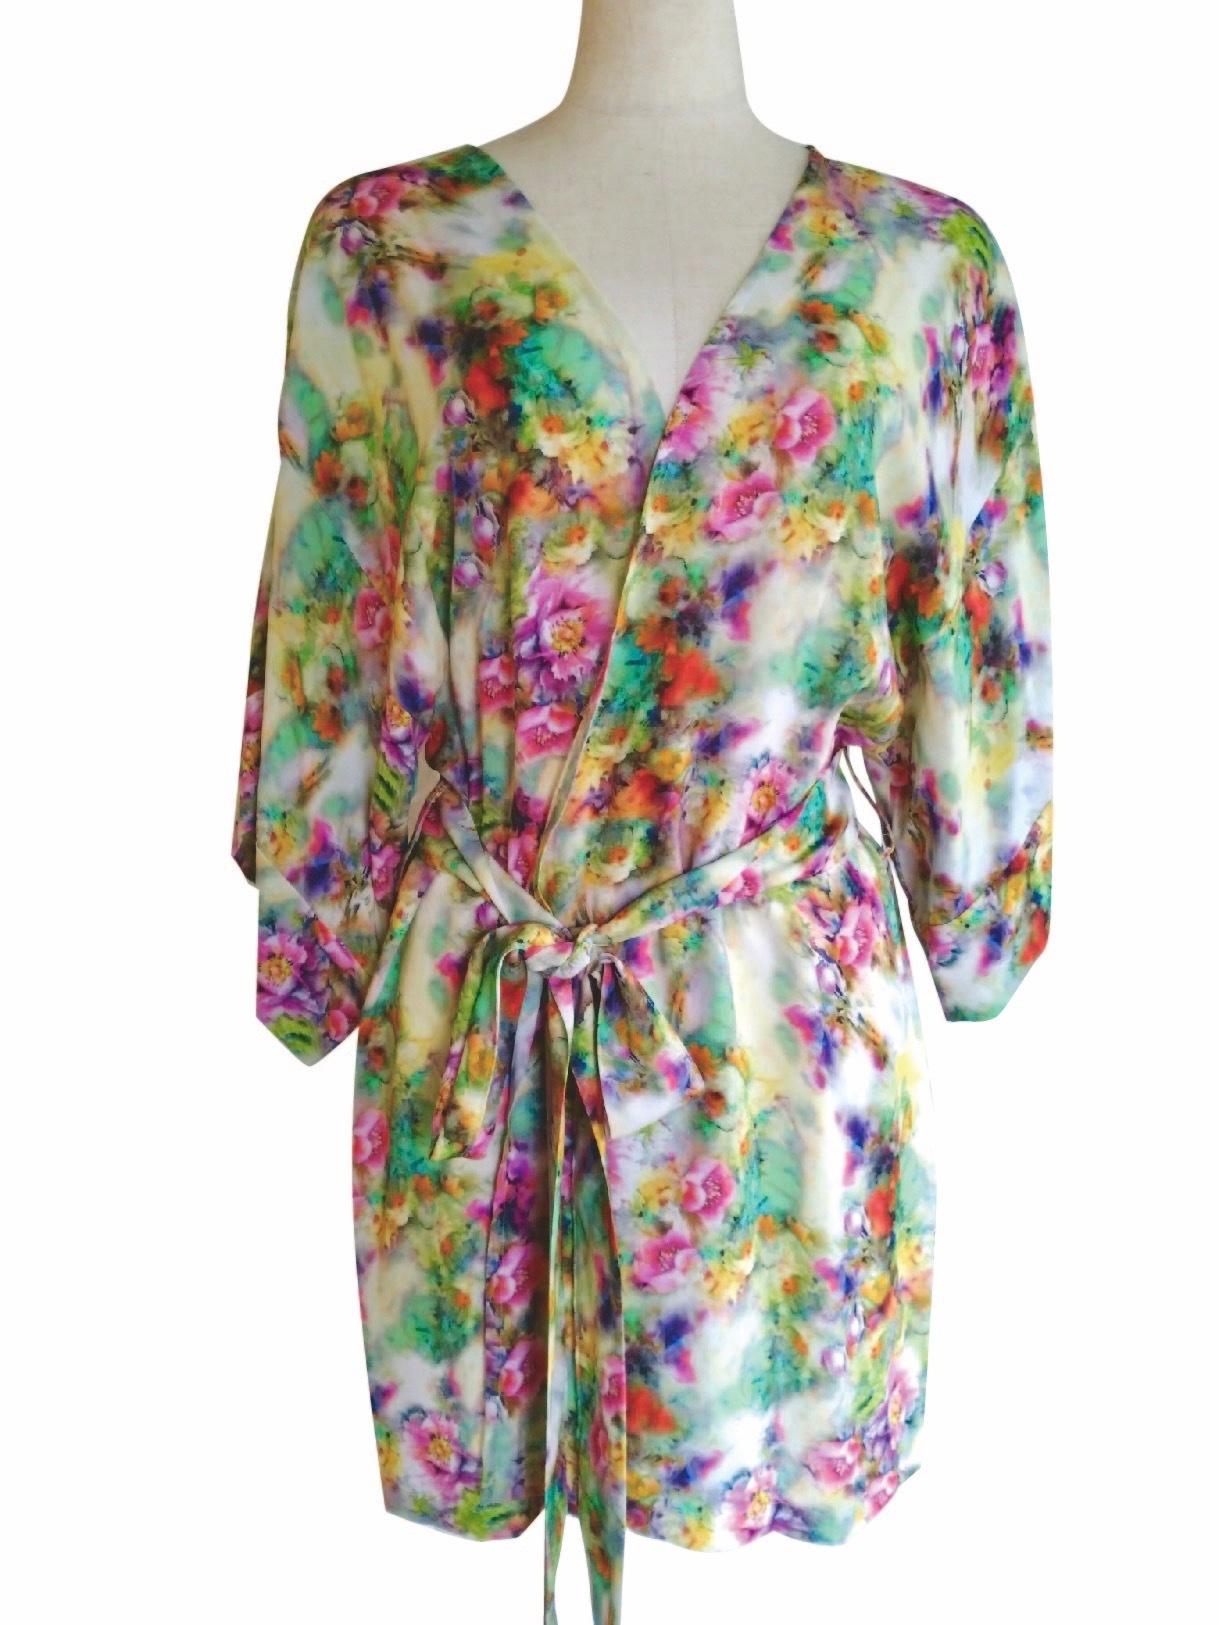 Kimono Robe Midium length Love from Sicilly ローブミディアム丈 シチリアから愛を込めて